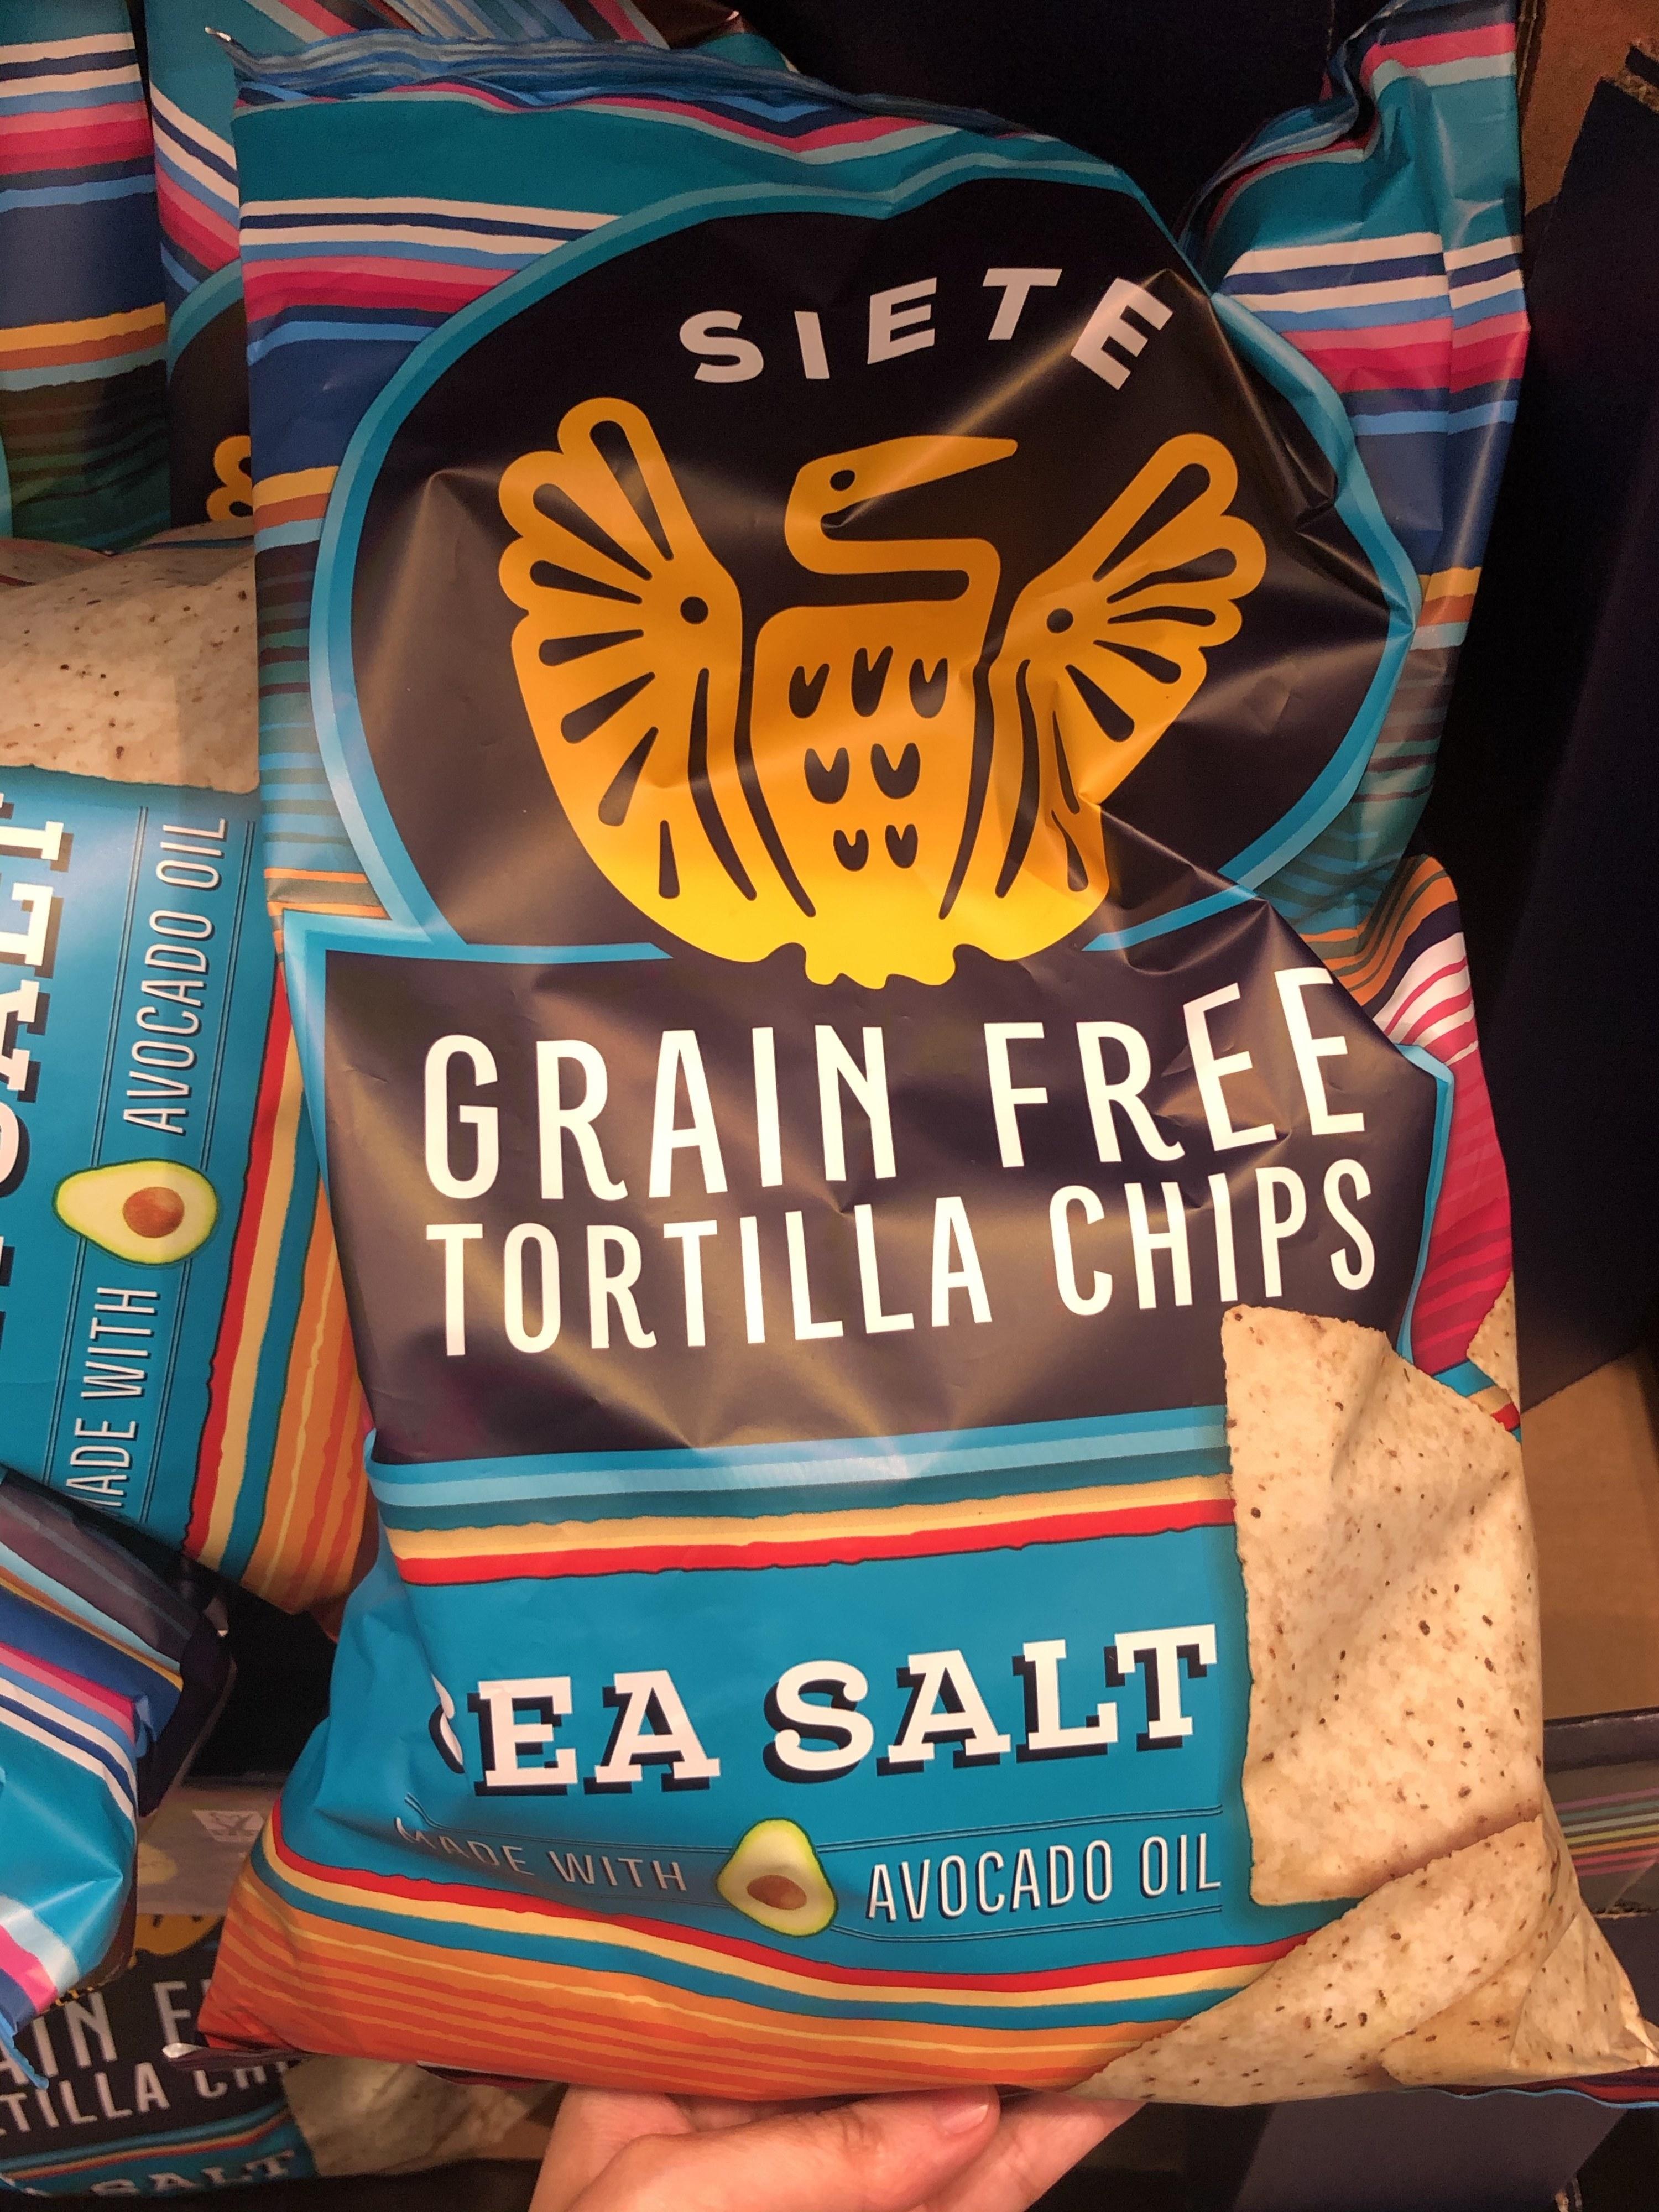 A bag of Siete grain-free tortilla chips